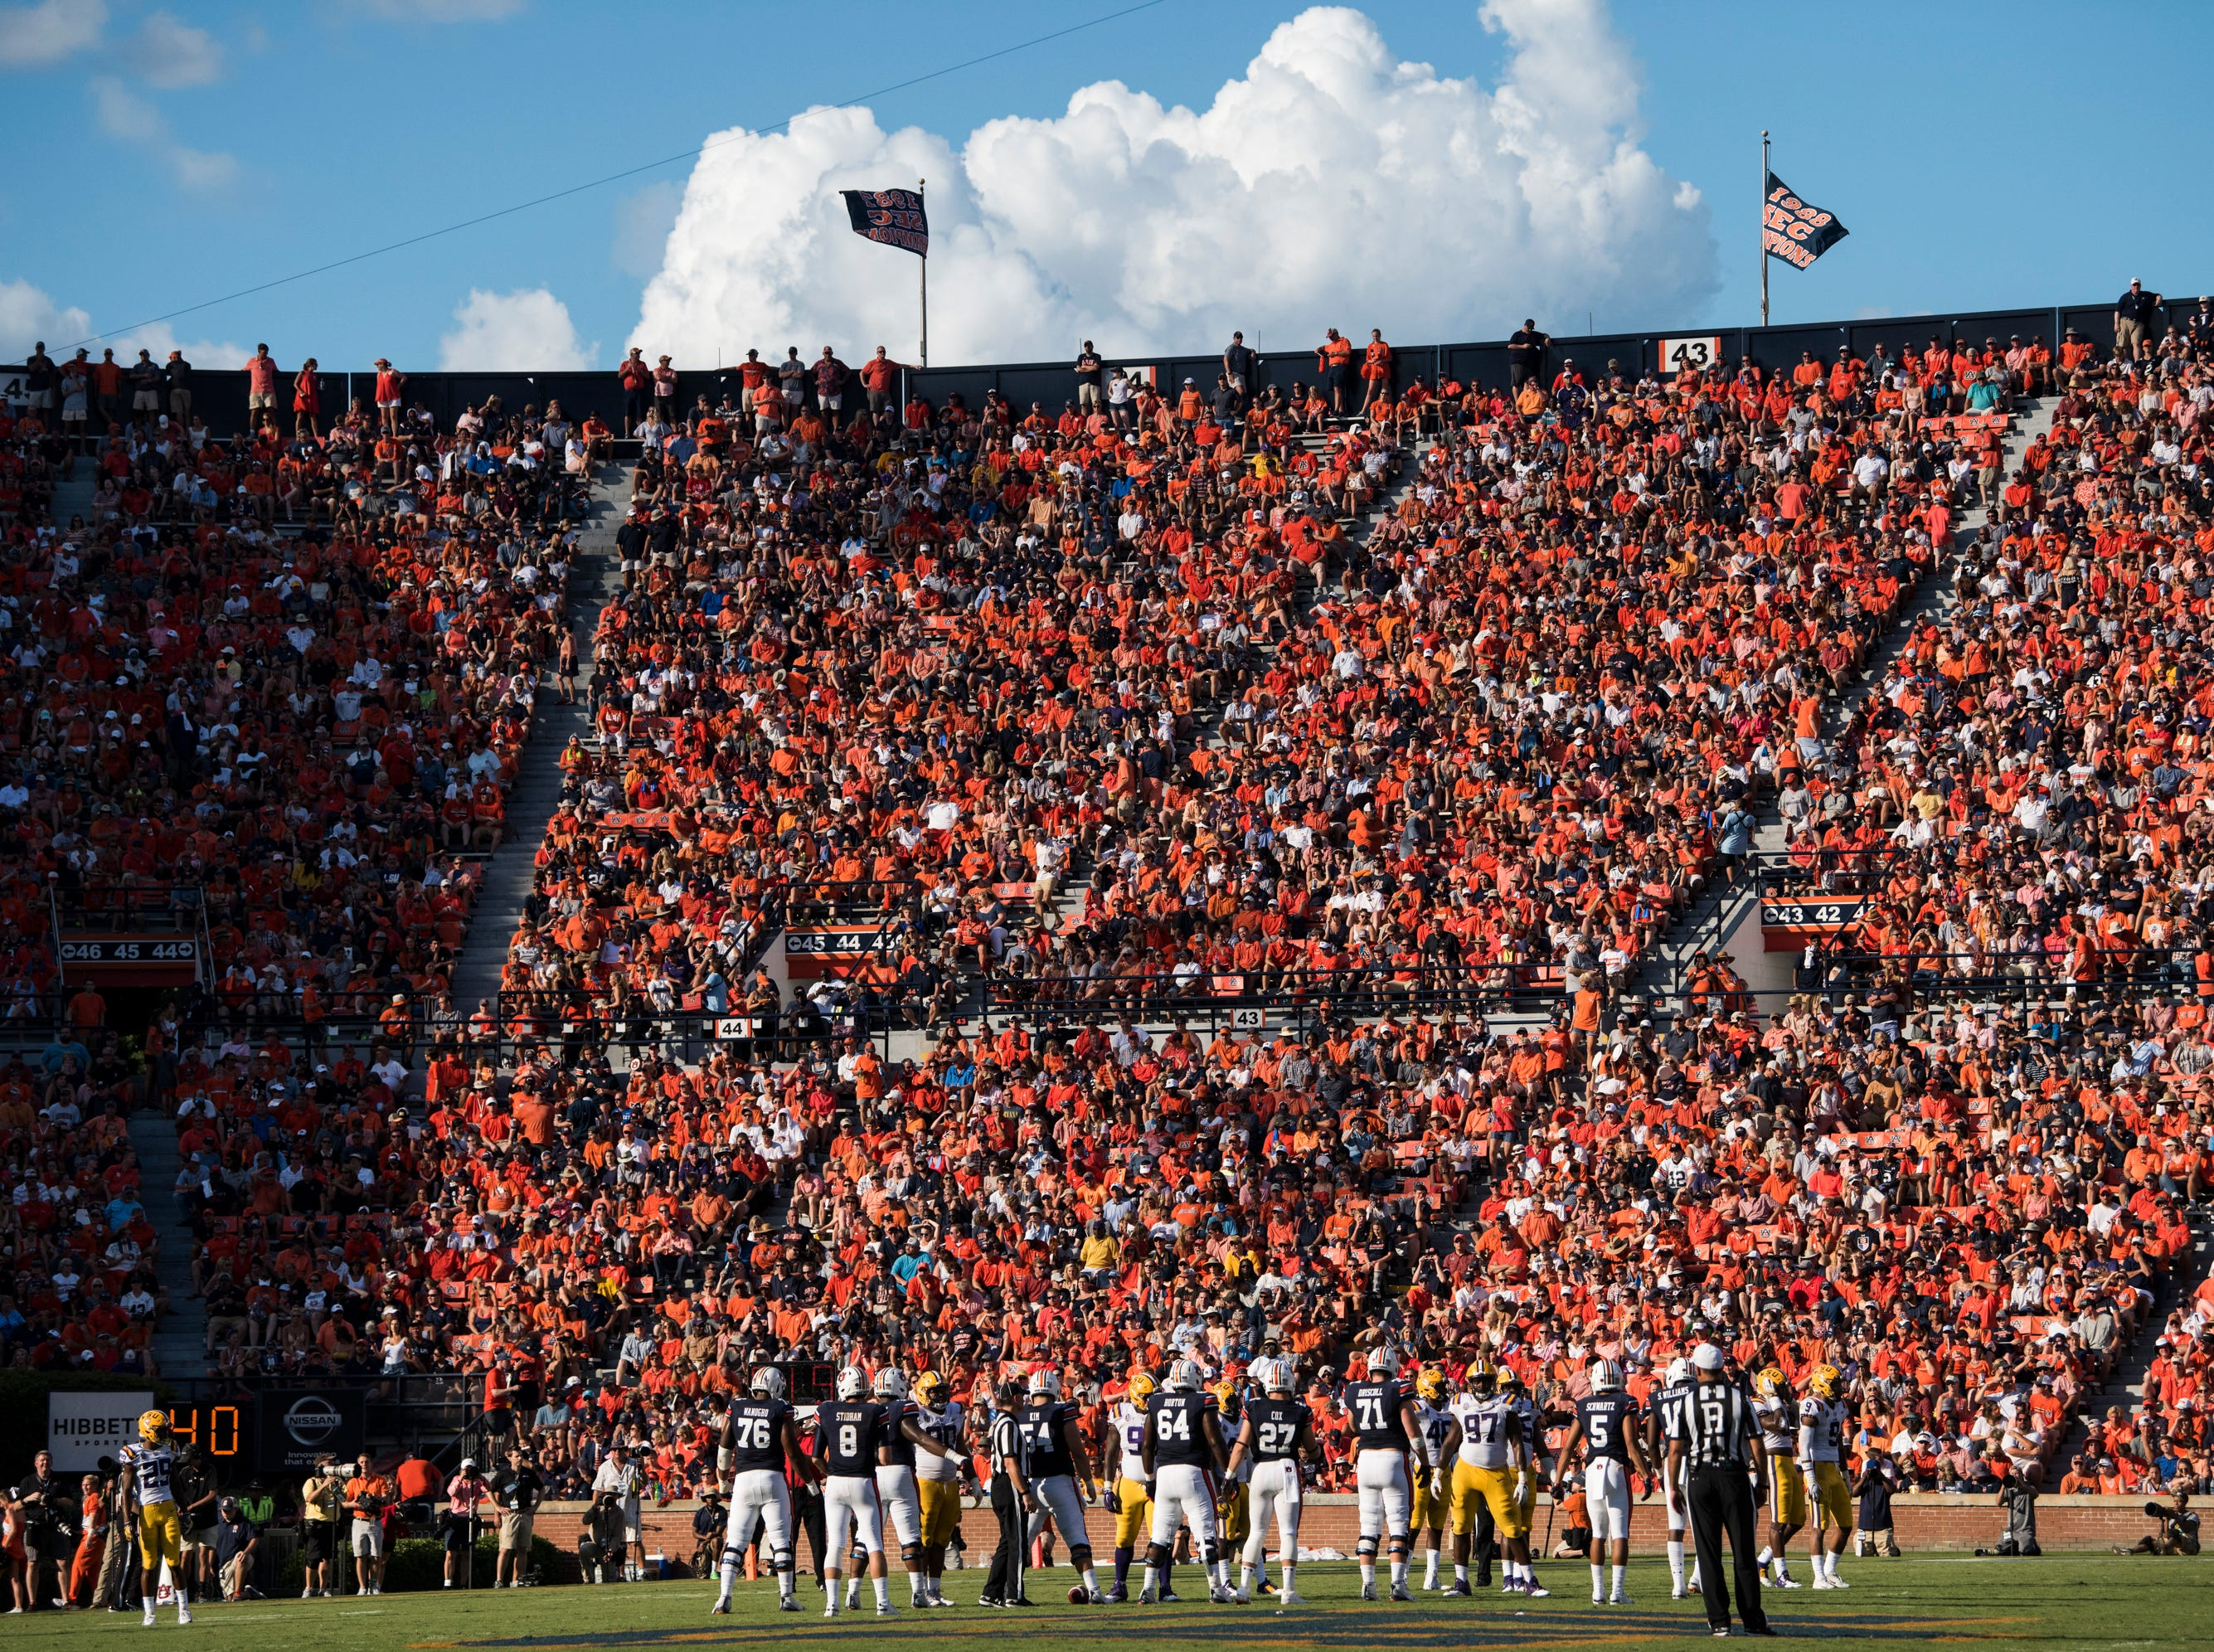 Auburn takes the field against LSU at Jordan-Hare Stadium in Auburn, Ala., on Saturday, Sept. 15, 2018. LSU defeated Auburn 22-21.